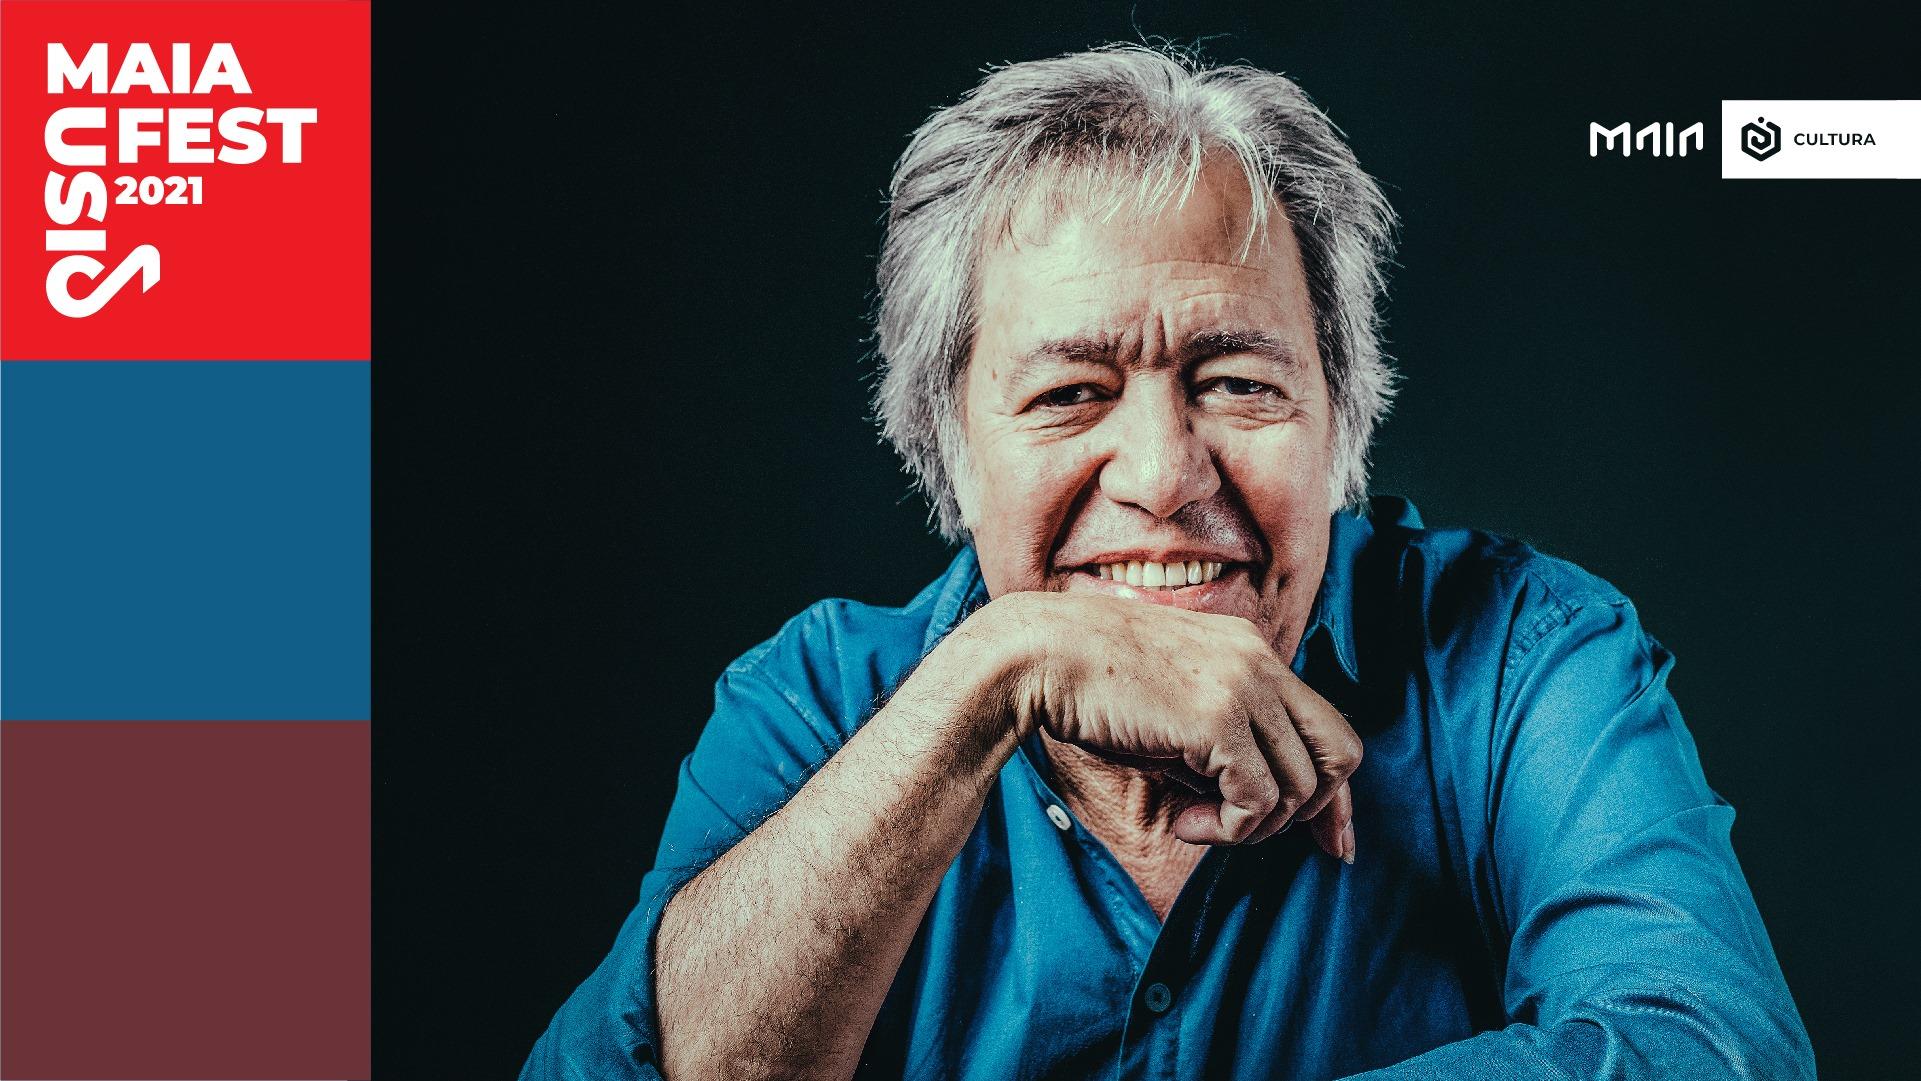 Sérgio Godinho - MaiaFest Music